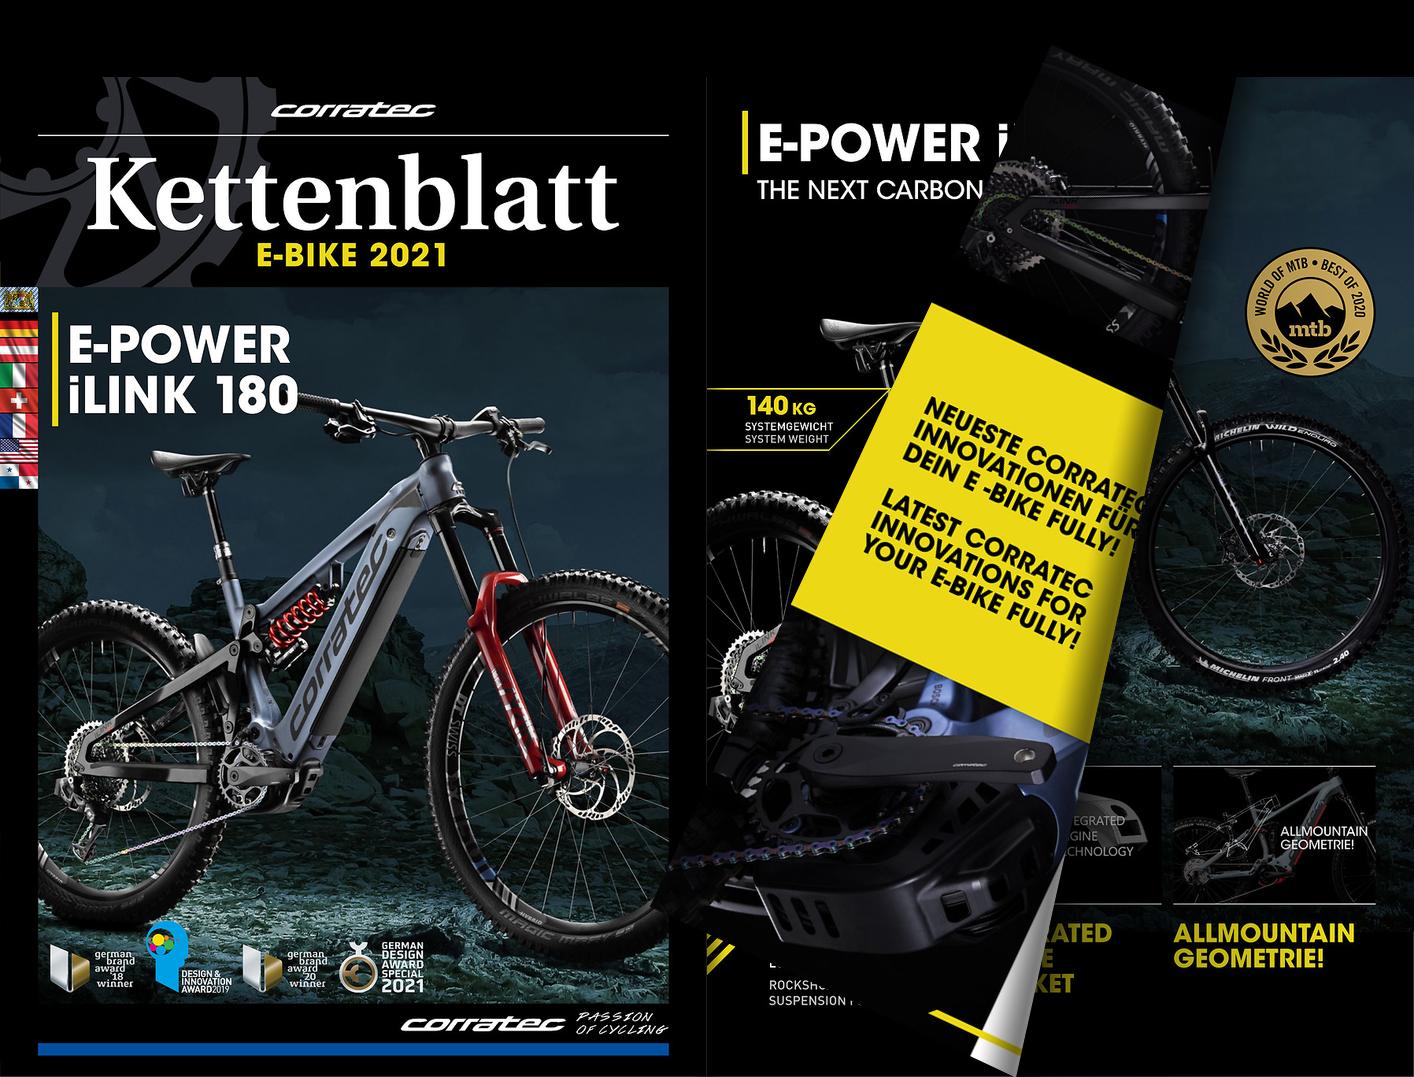 Kettenblatt E-Bike 2021